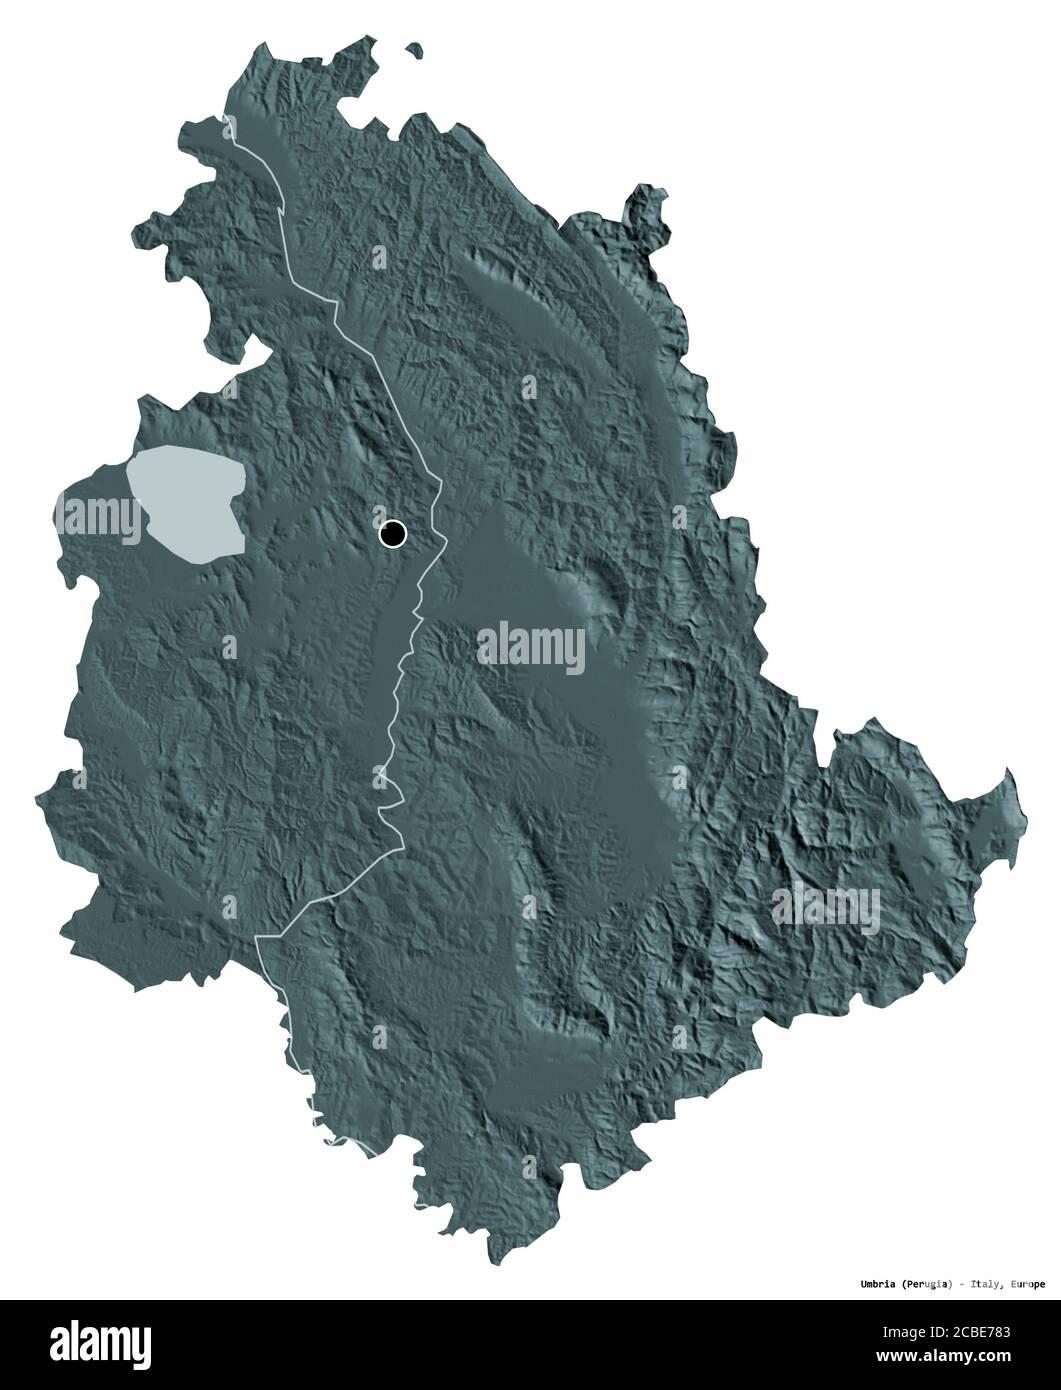 Cartina Politica Dell Umbria.Umbria Region Map Immagini E Fotos Stock Alamy